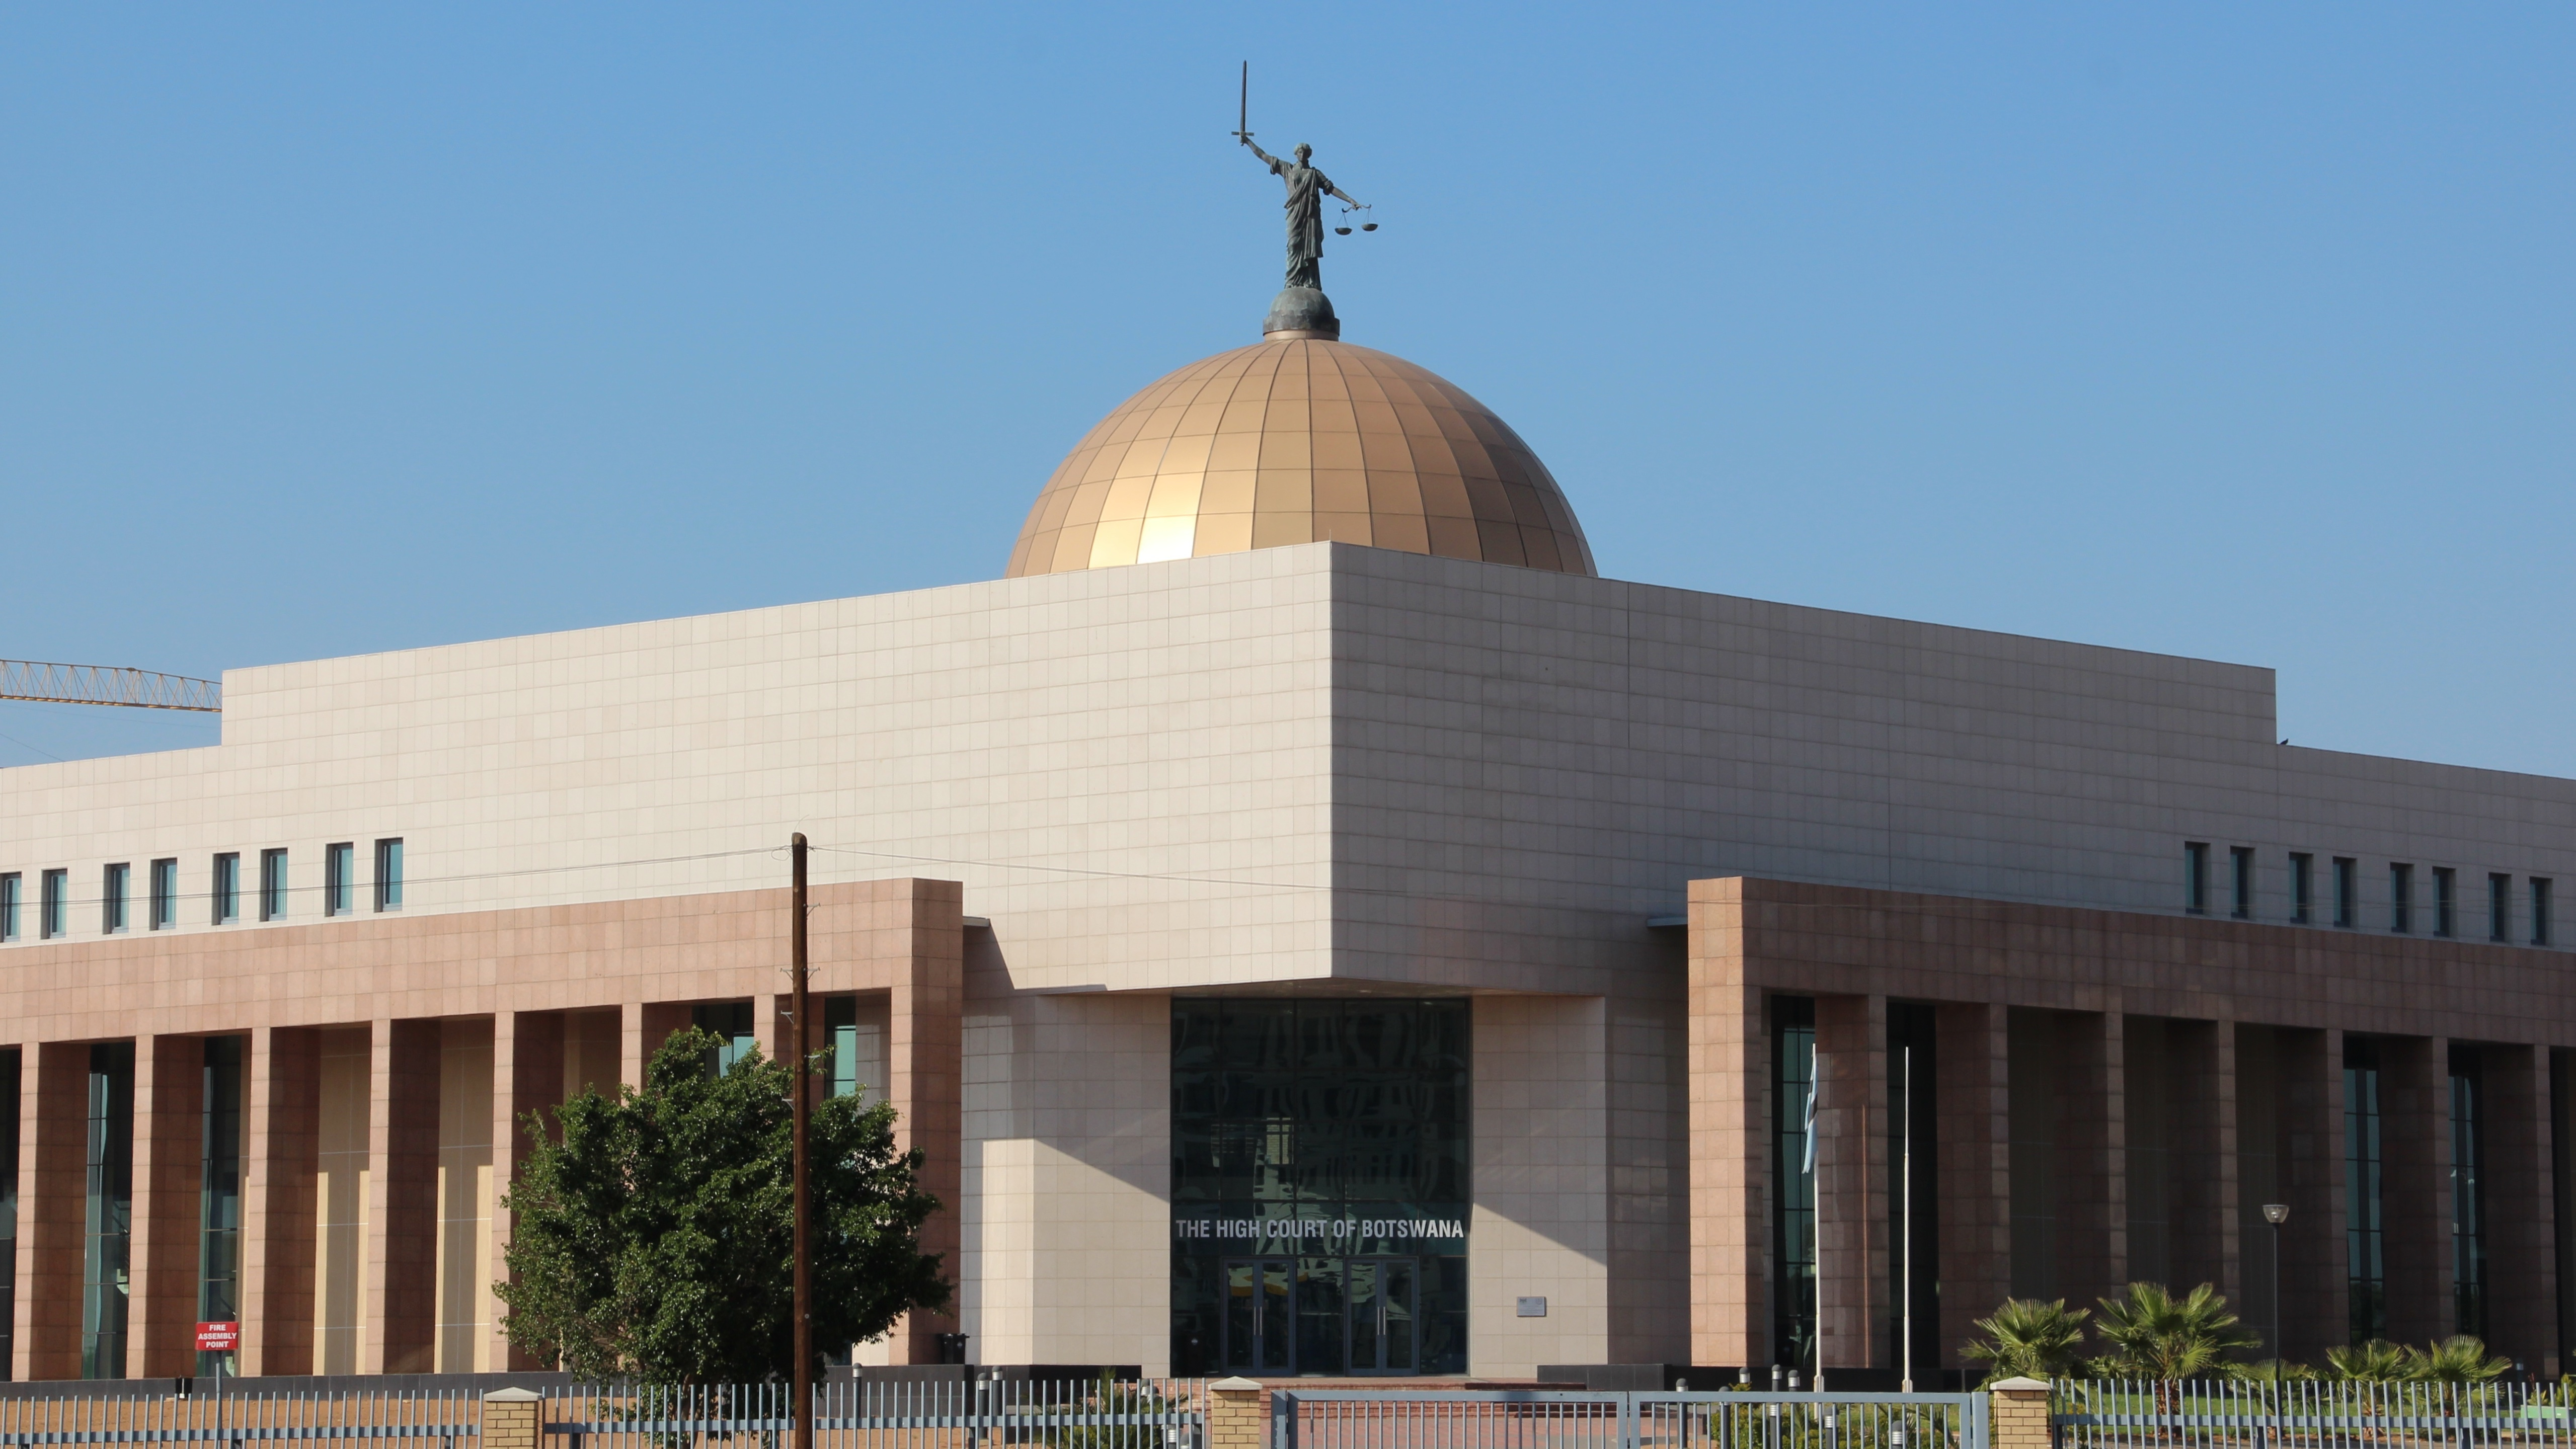 News Release: Botswana high court decriminalises consensual same-sex sexual conduct